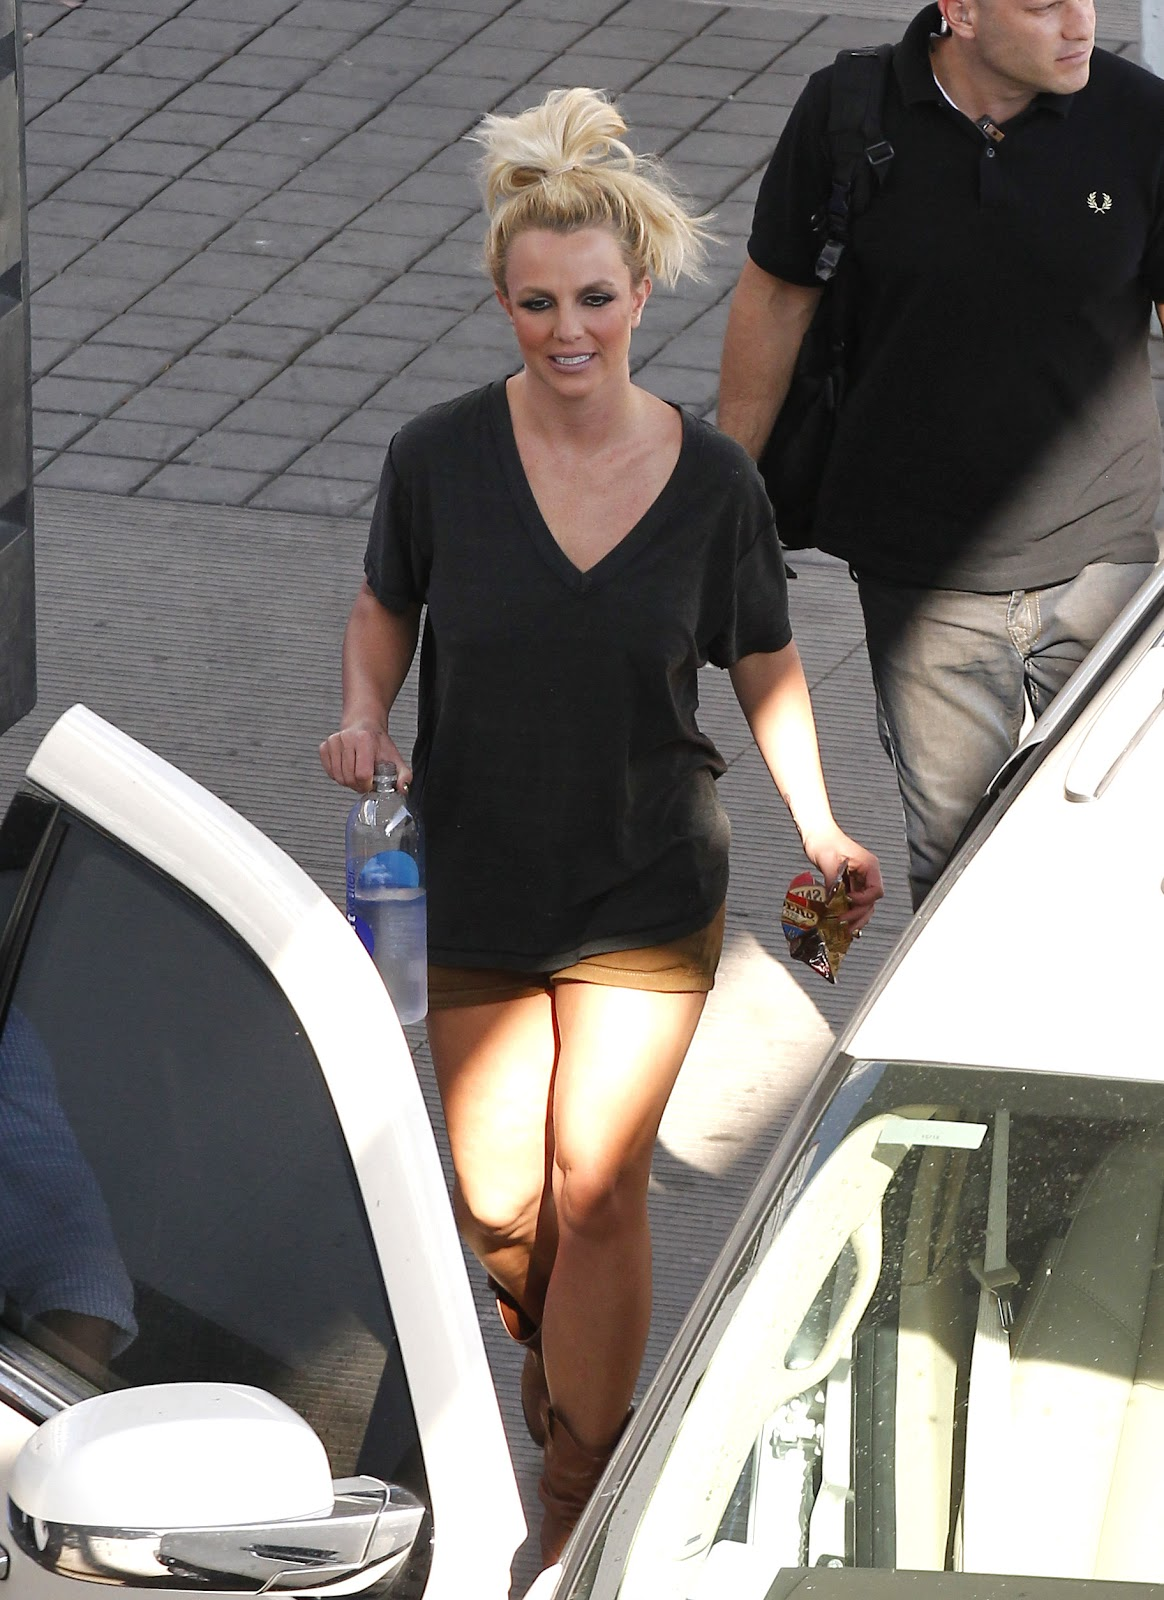 http://2.bp.blogspot.com/-BQ7bd24qGmg/UClOsuNkv6I/AAAAAAAAX_M/RCitArd2cSQ/s1600/Britney+Spears+Leggy+in+Shorts+Leaving+a+Studio+in+Beverly+Hills+-+August+10,+2012+6.jpg